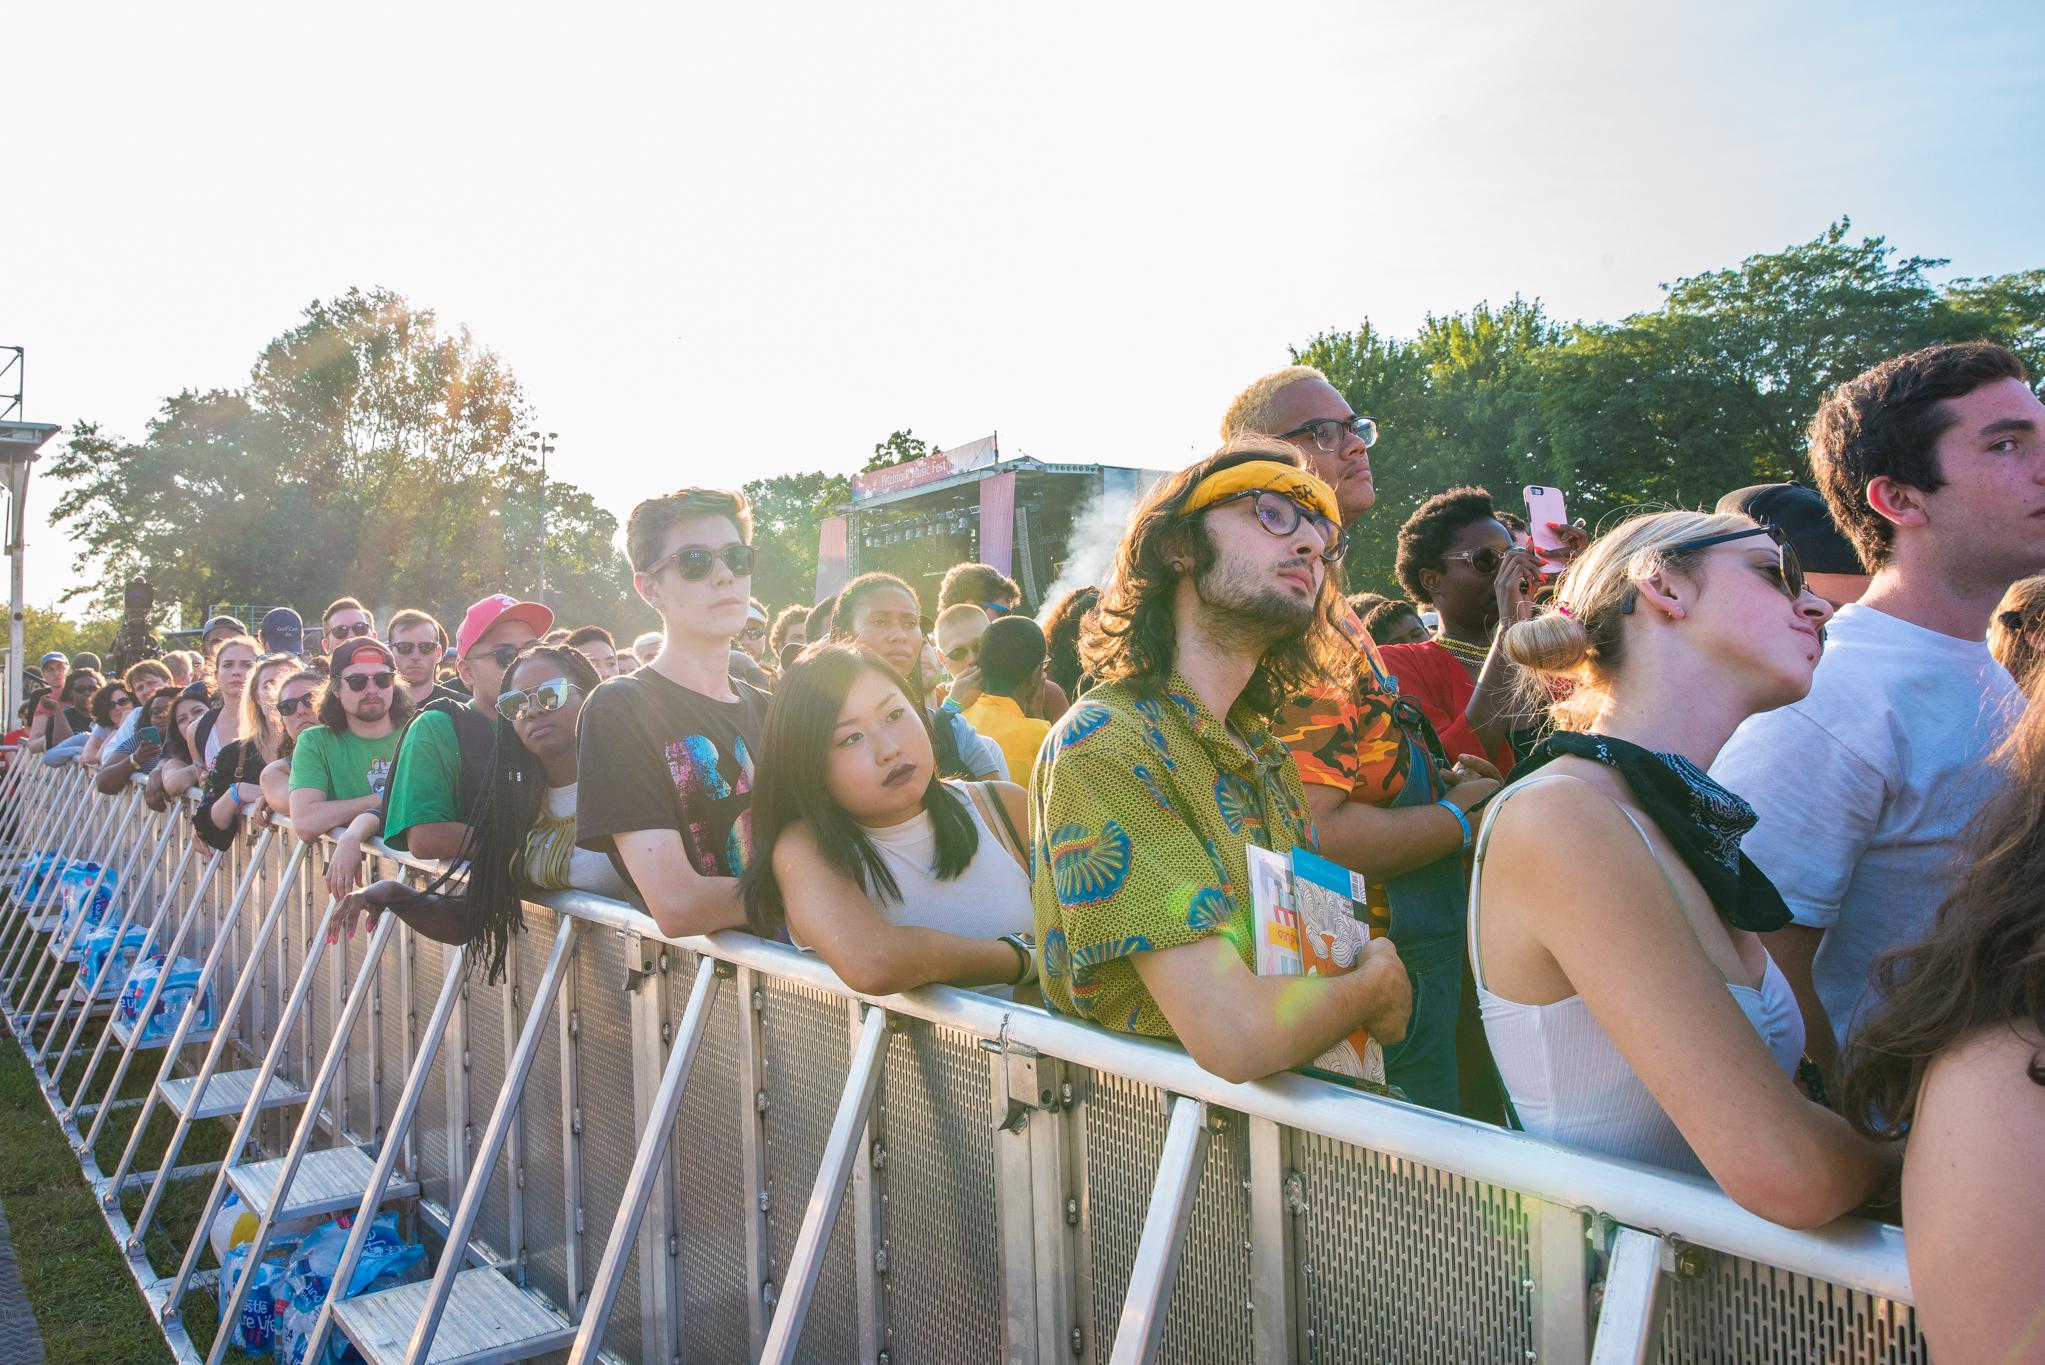 Pitchfork Music Festival 2017, Neal O'Bryan